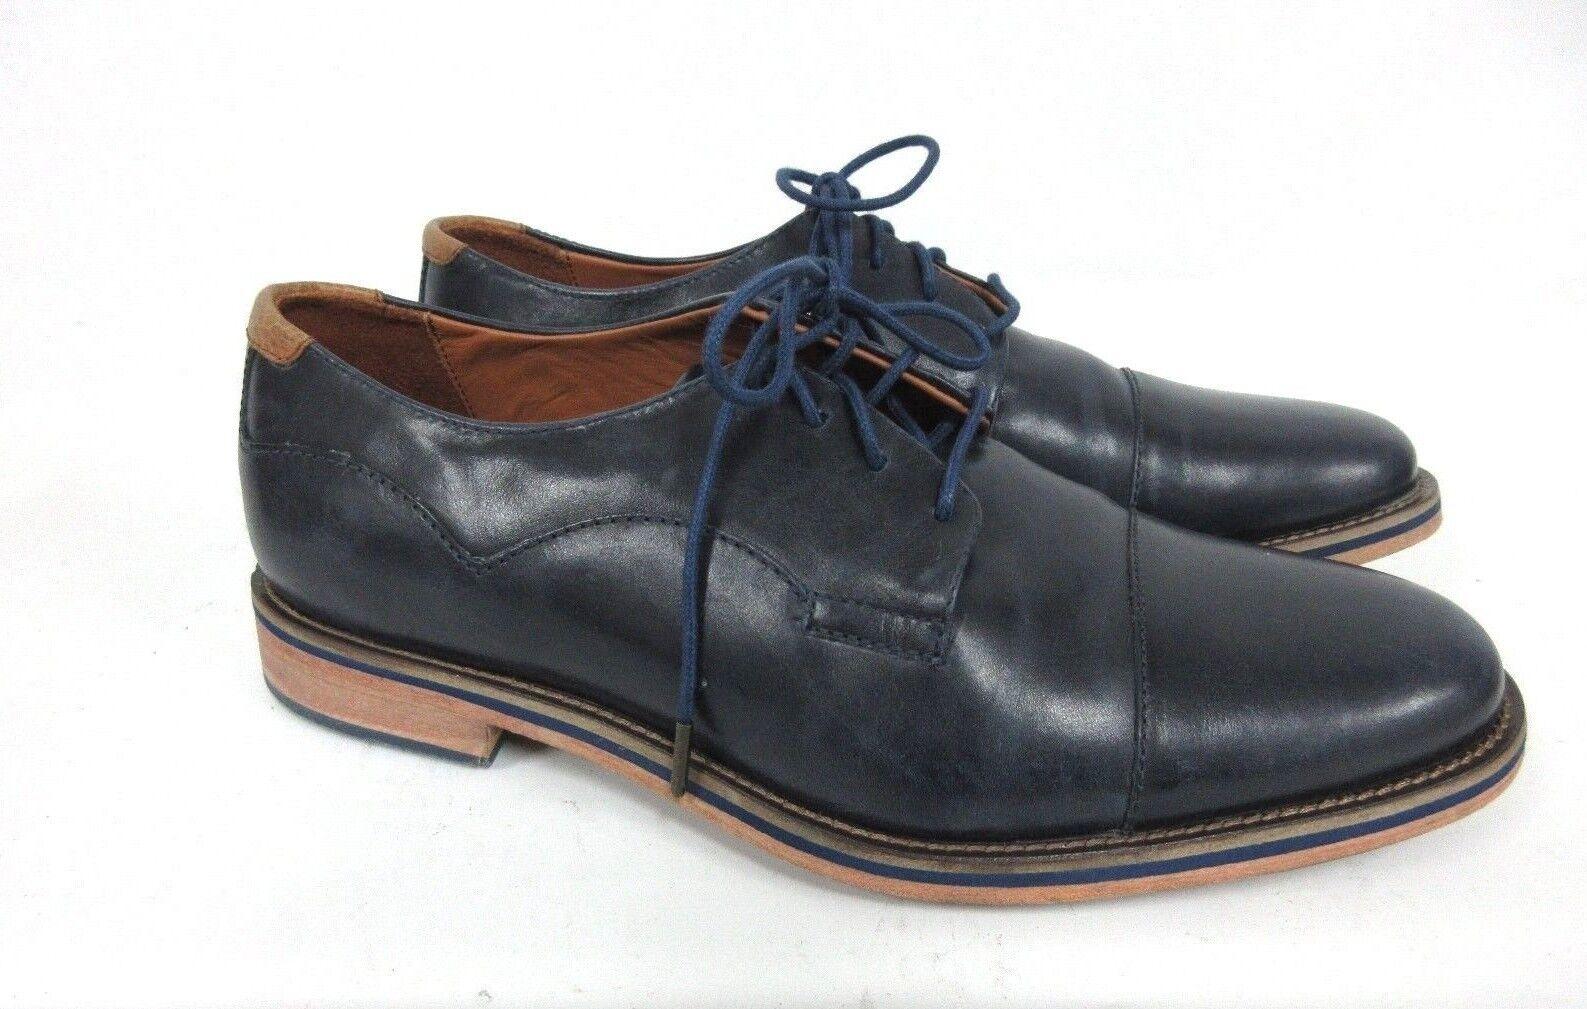 NEU J.Schuhe Herren Indi Oxford marineblau Leder Größe: 8.5